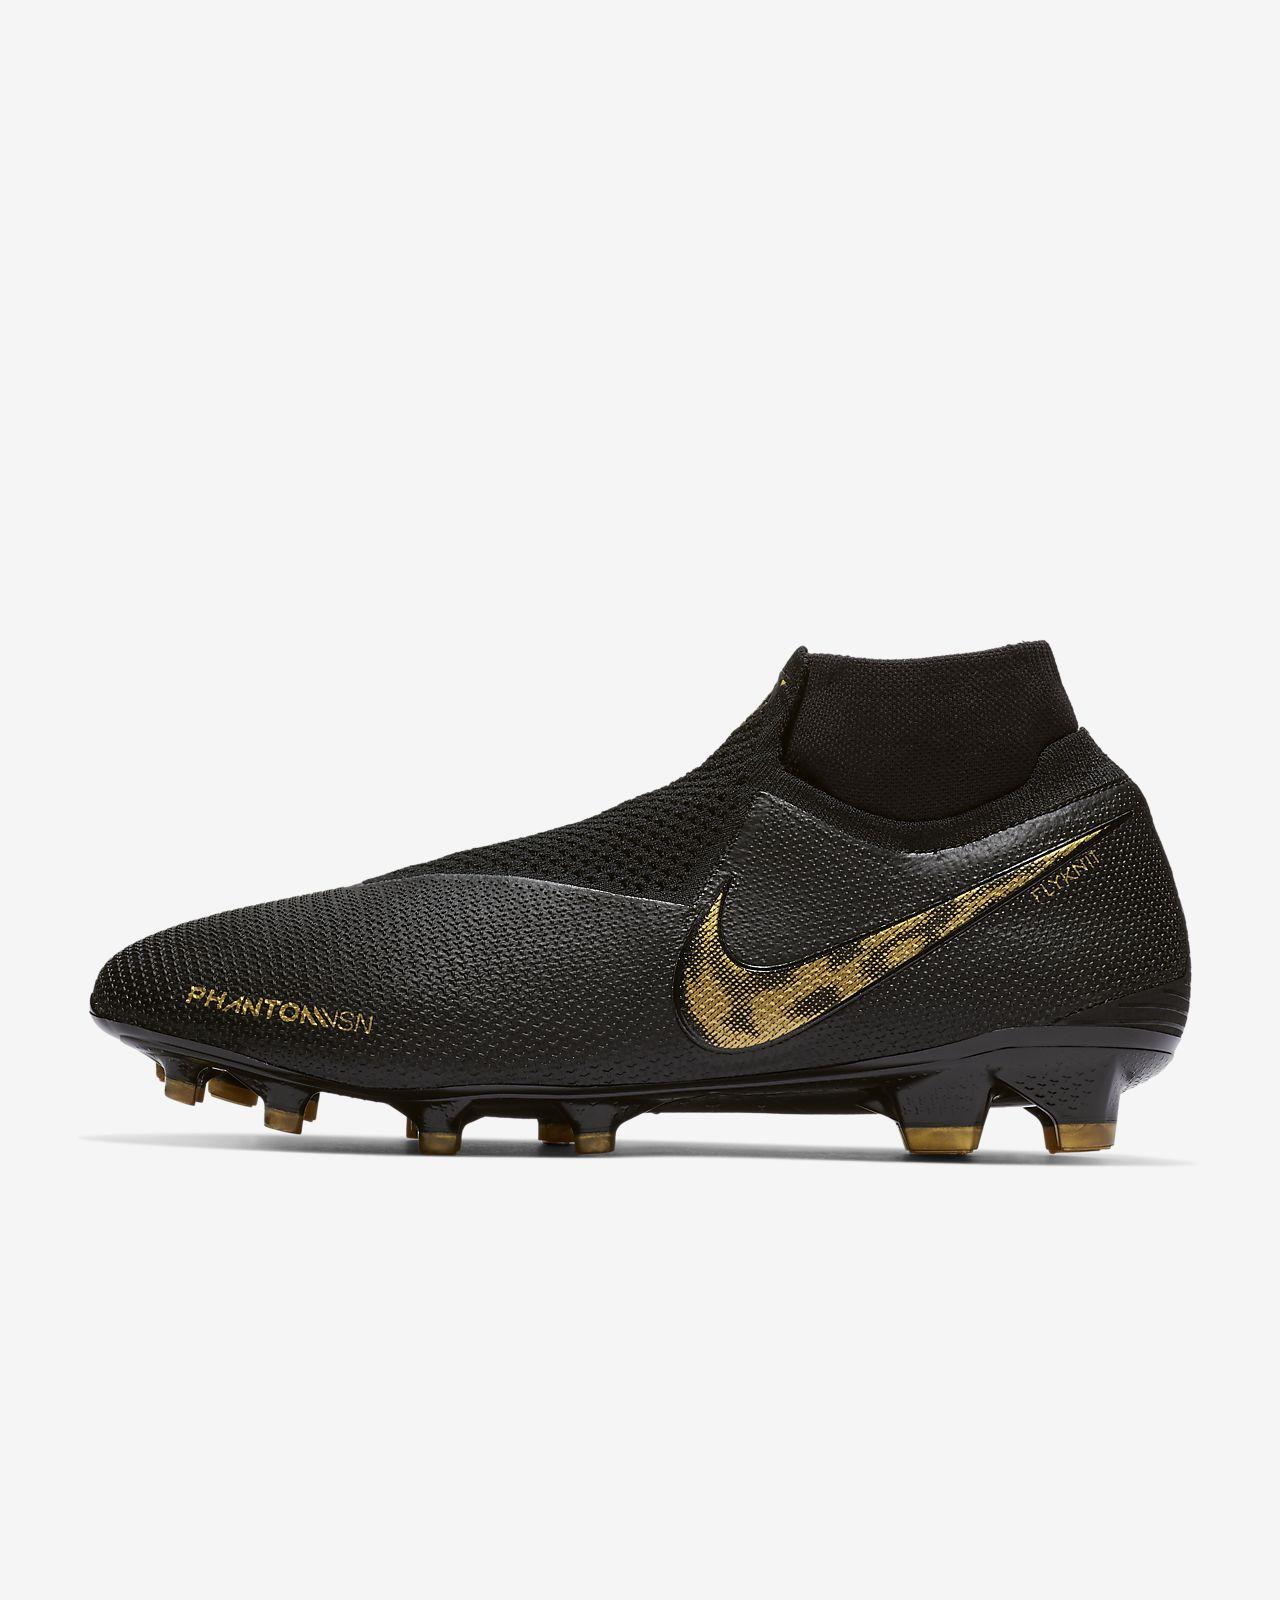 Nike Phantom Vision Elite Dynamic Fit FG Botas de fútbol para terreno firme